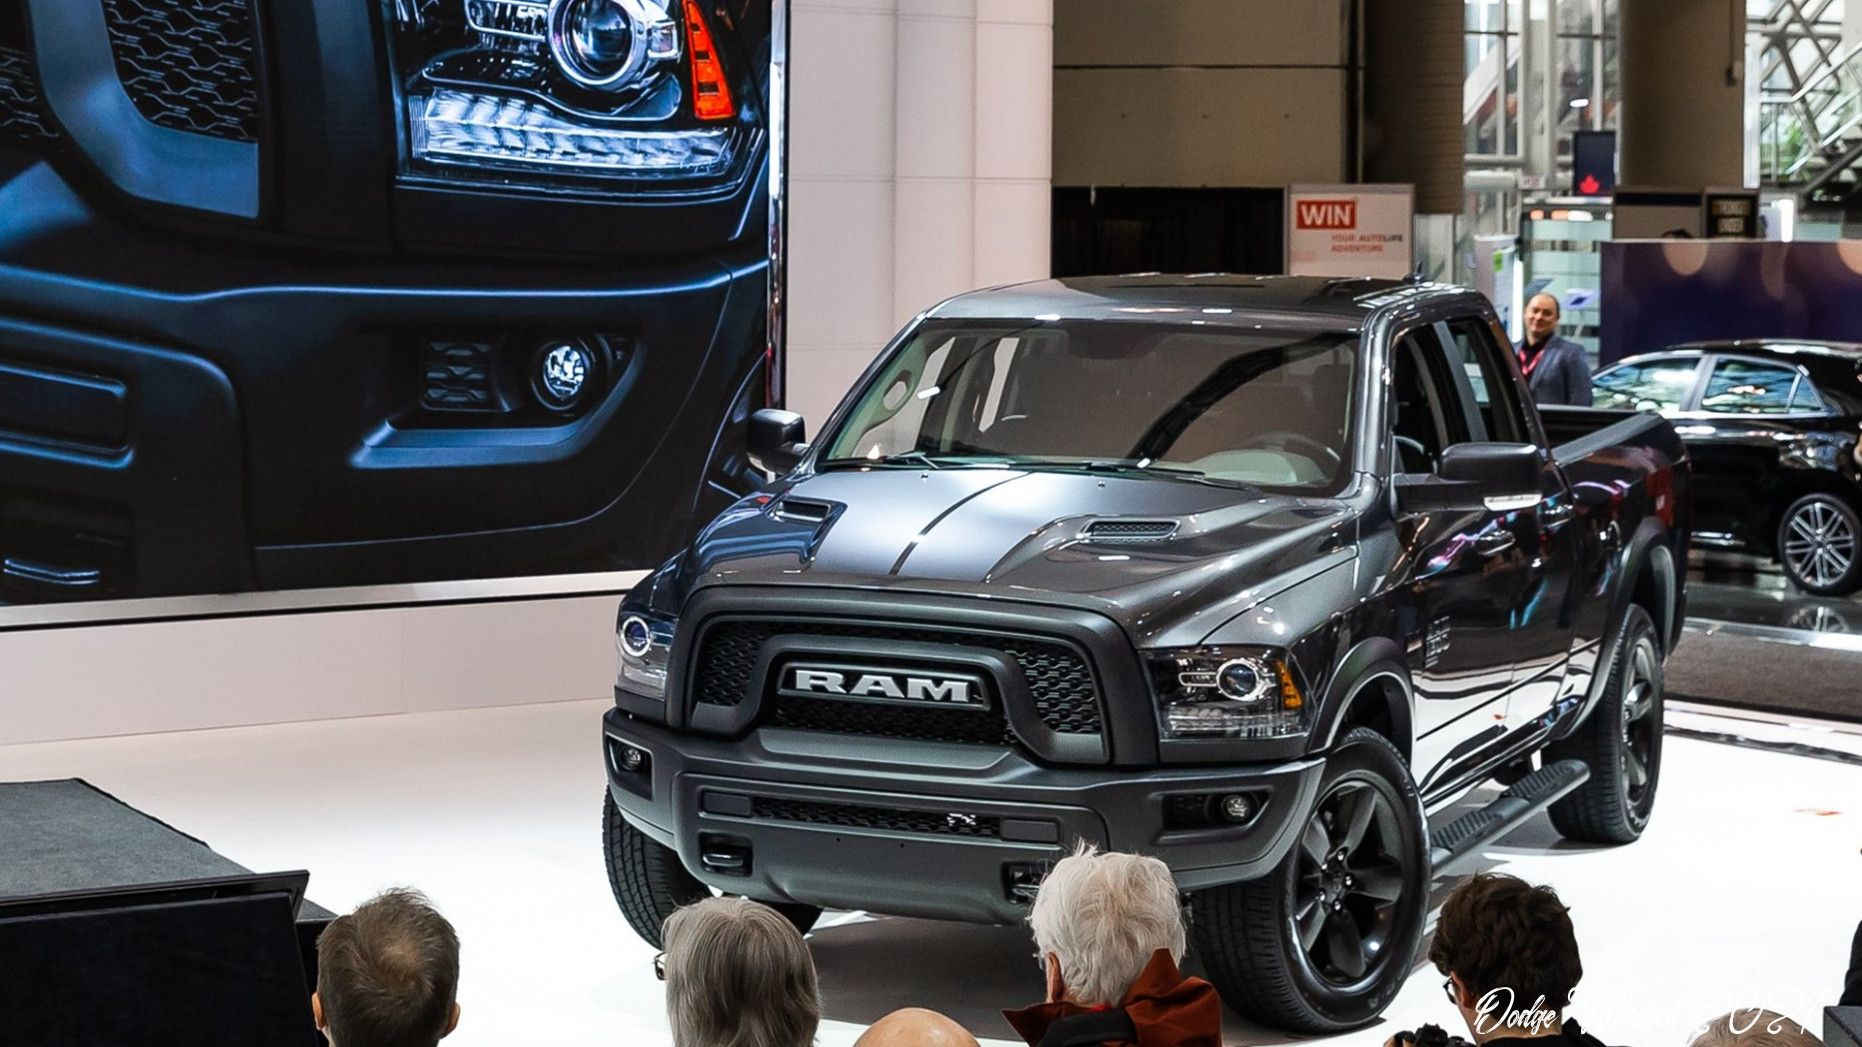 Dodge Warlock 2021 Redesign In 2020 Classic Pickup Trucks Chrysler Dodge Jeep Cool Sports Cars